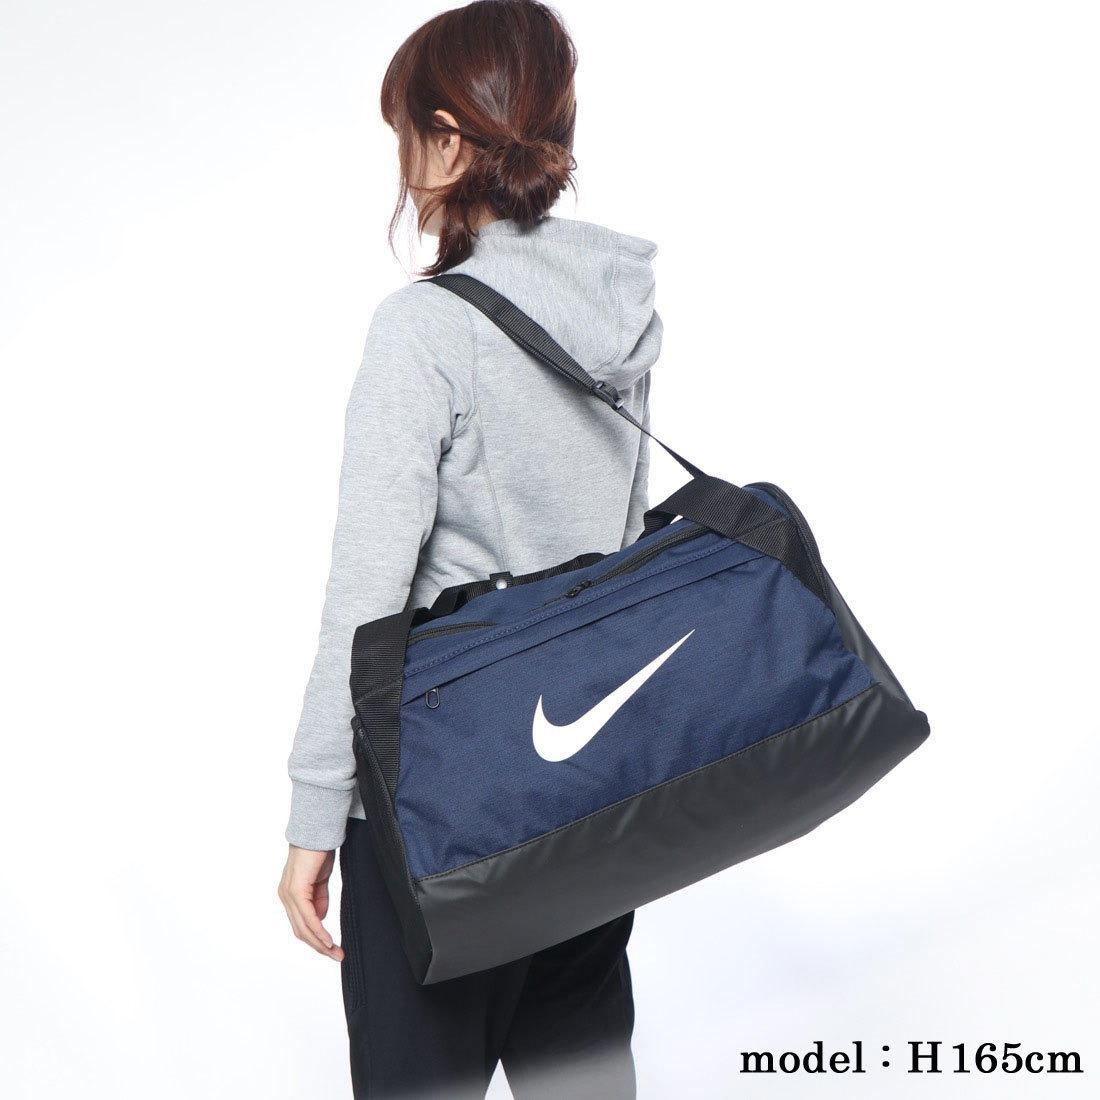 b3c7b782b Bolsa Nike Brasilia Duffel Small - Ba5976-410 Marinho - R$ 139,90 em ...